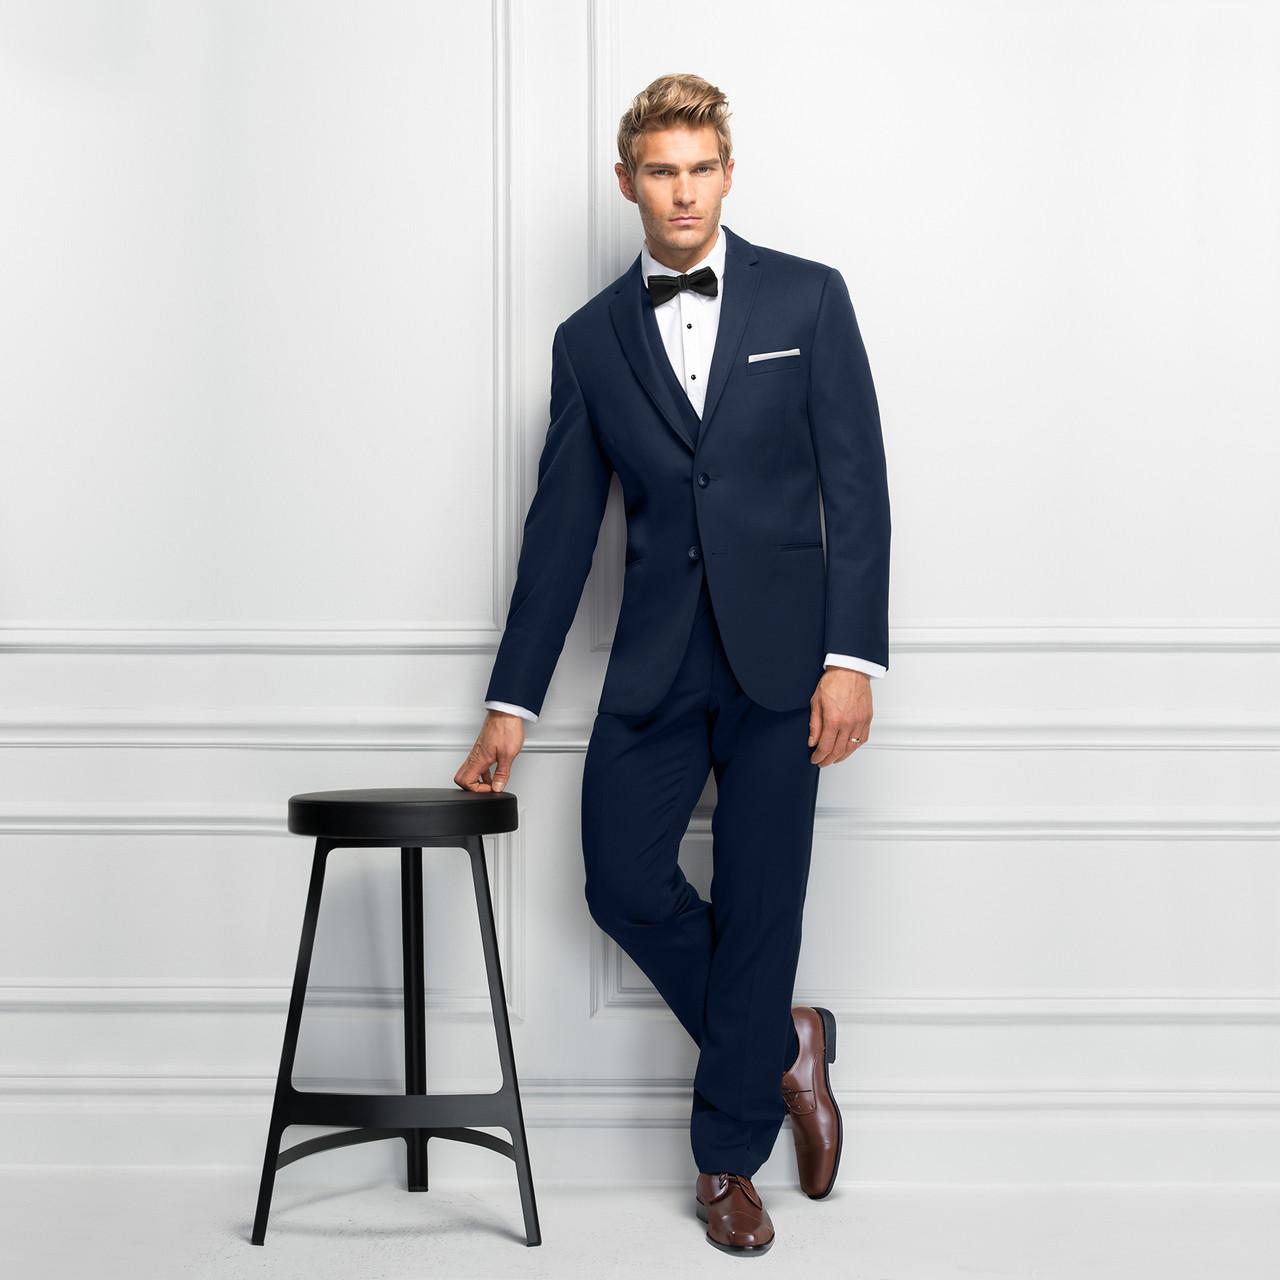 7c37567b720e Michael Kors Ultra Slim Fit Navy Sterling Wedding Suit Style J 371. Image  1. Loading zoom